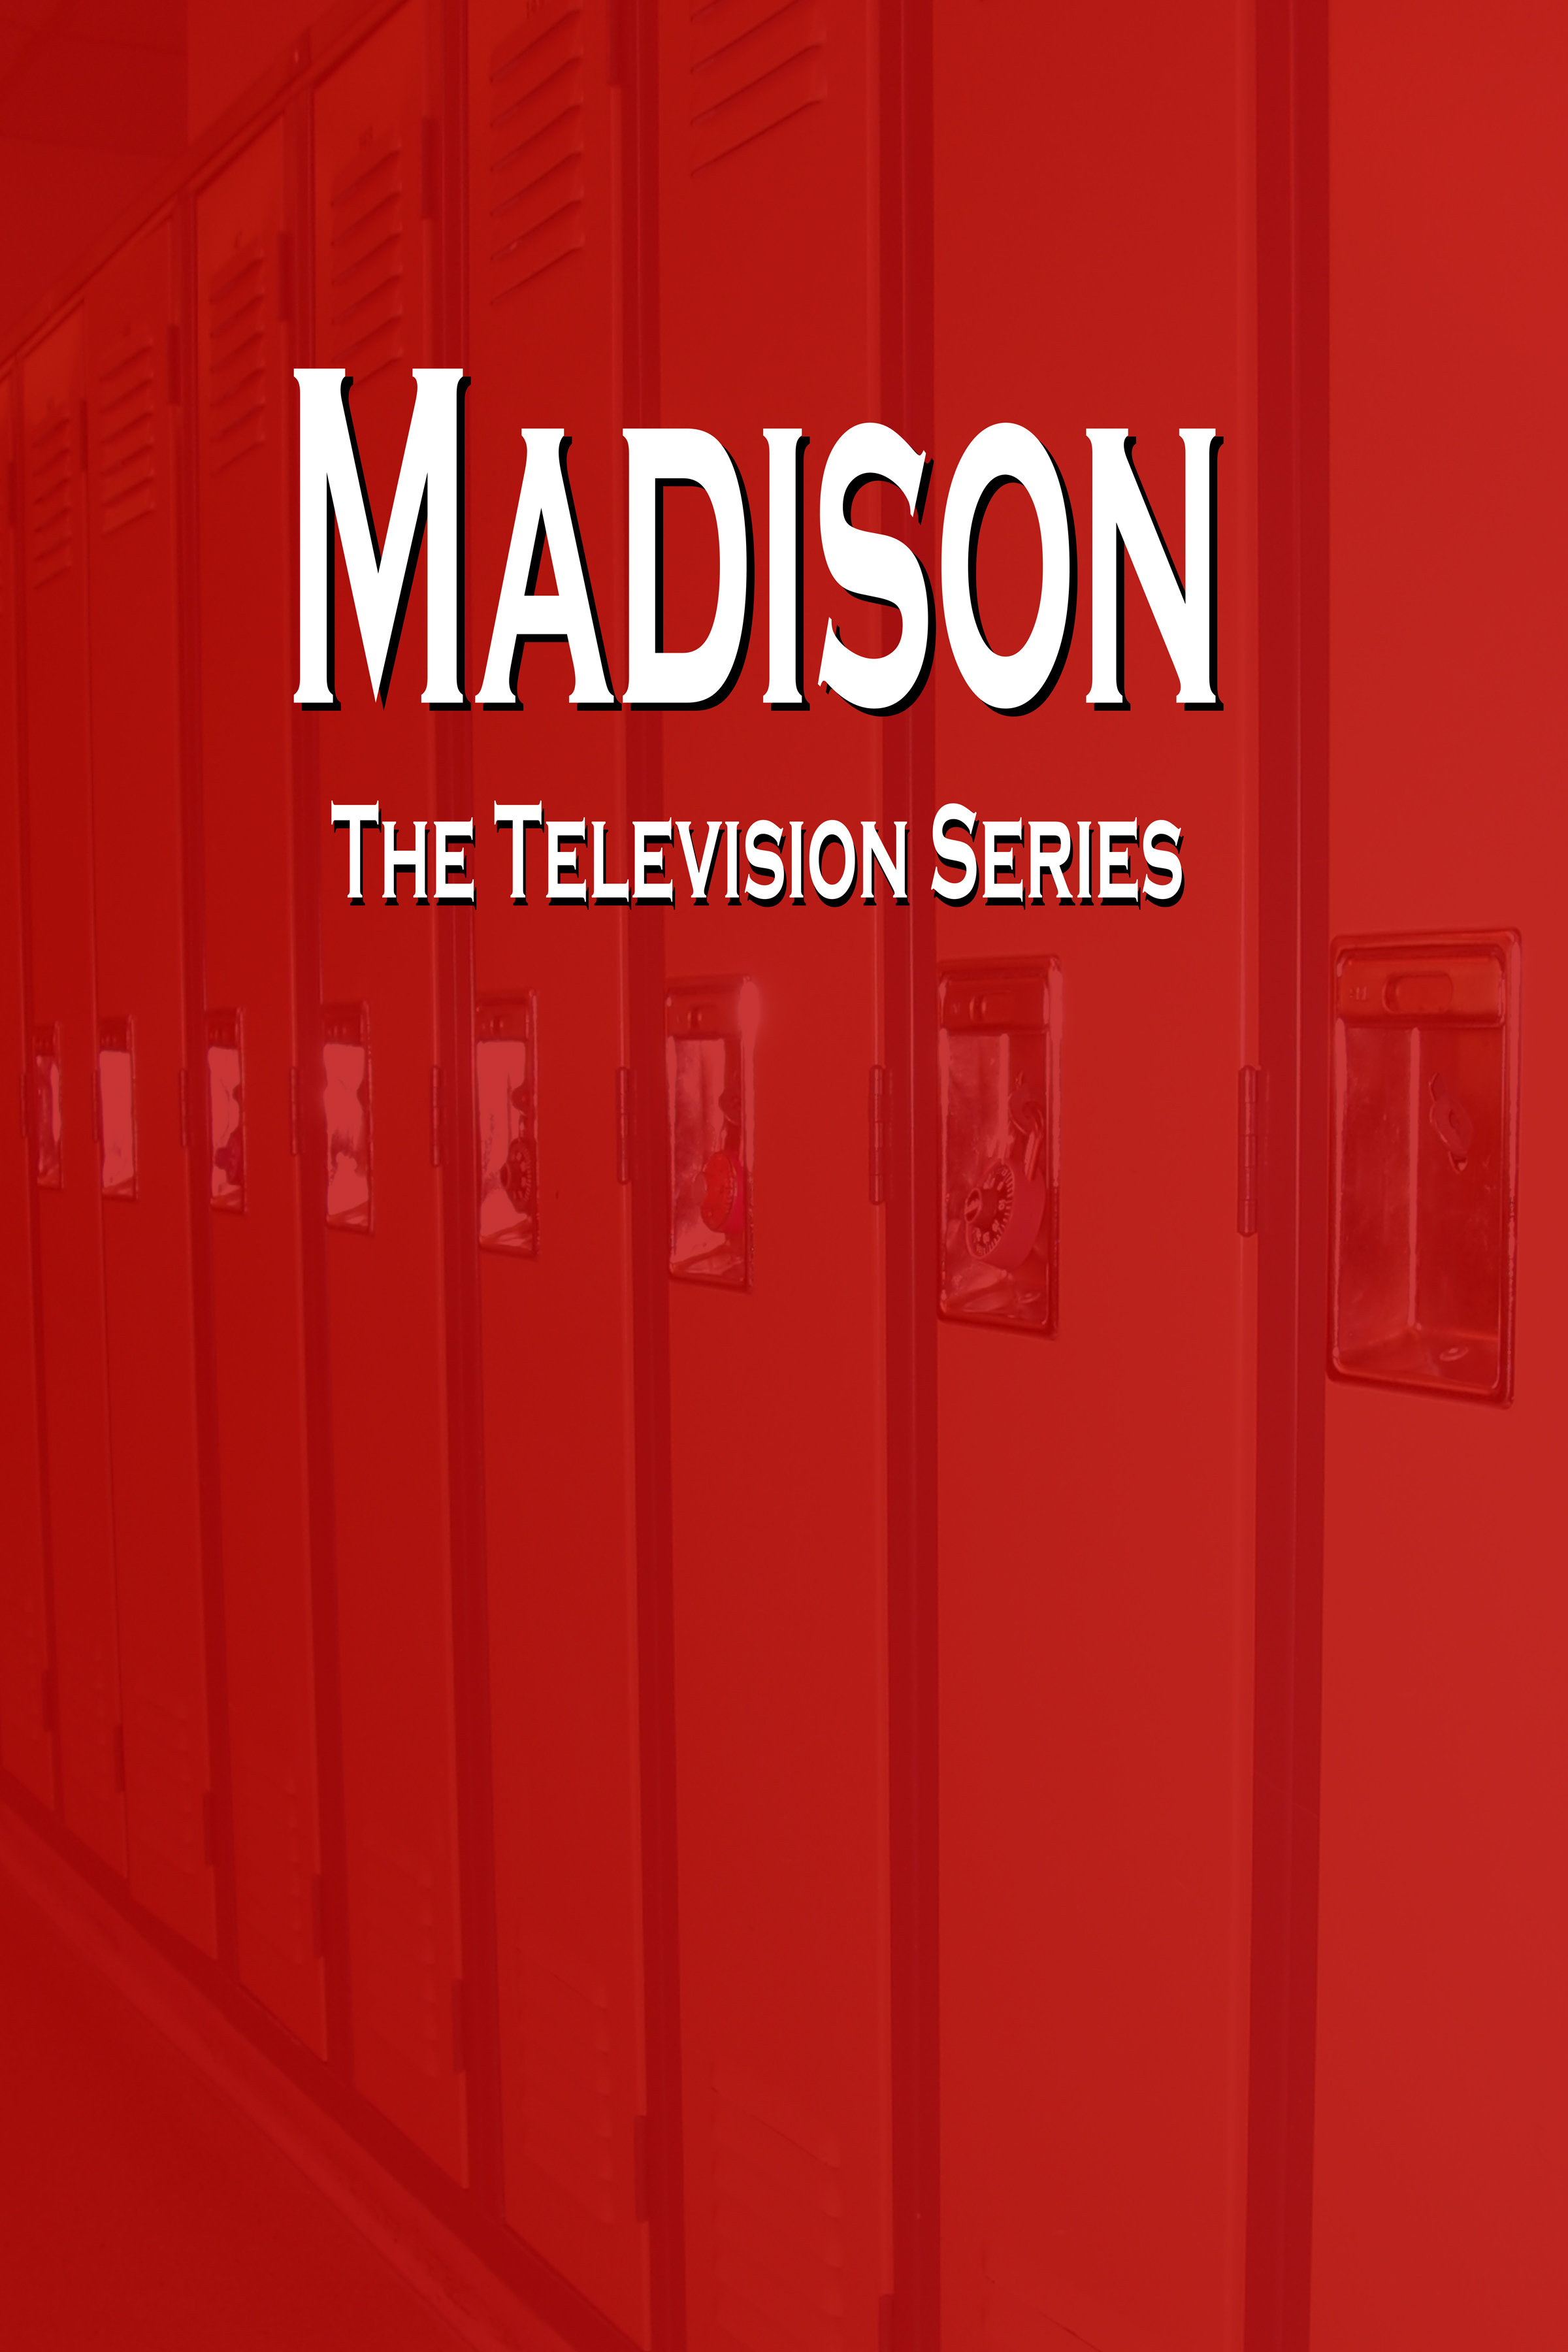 Madison (1993)